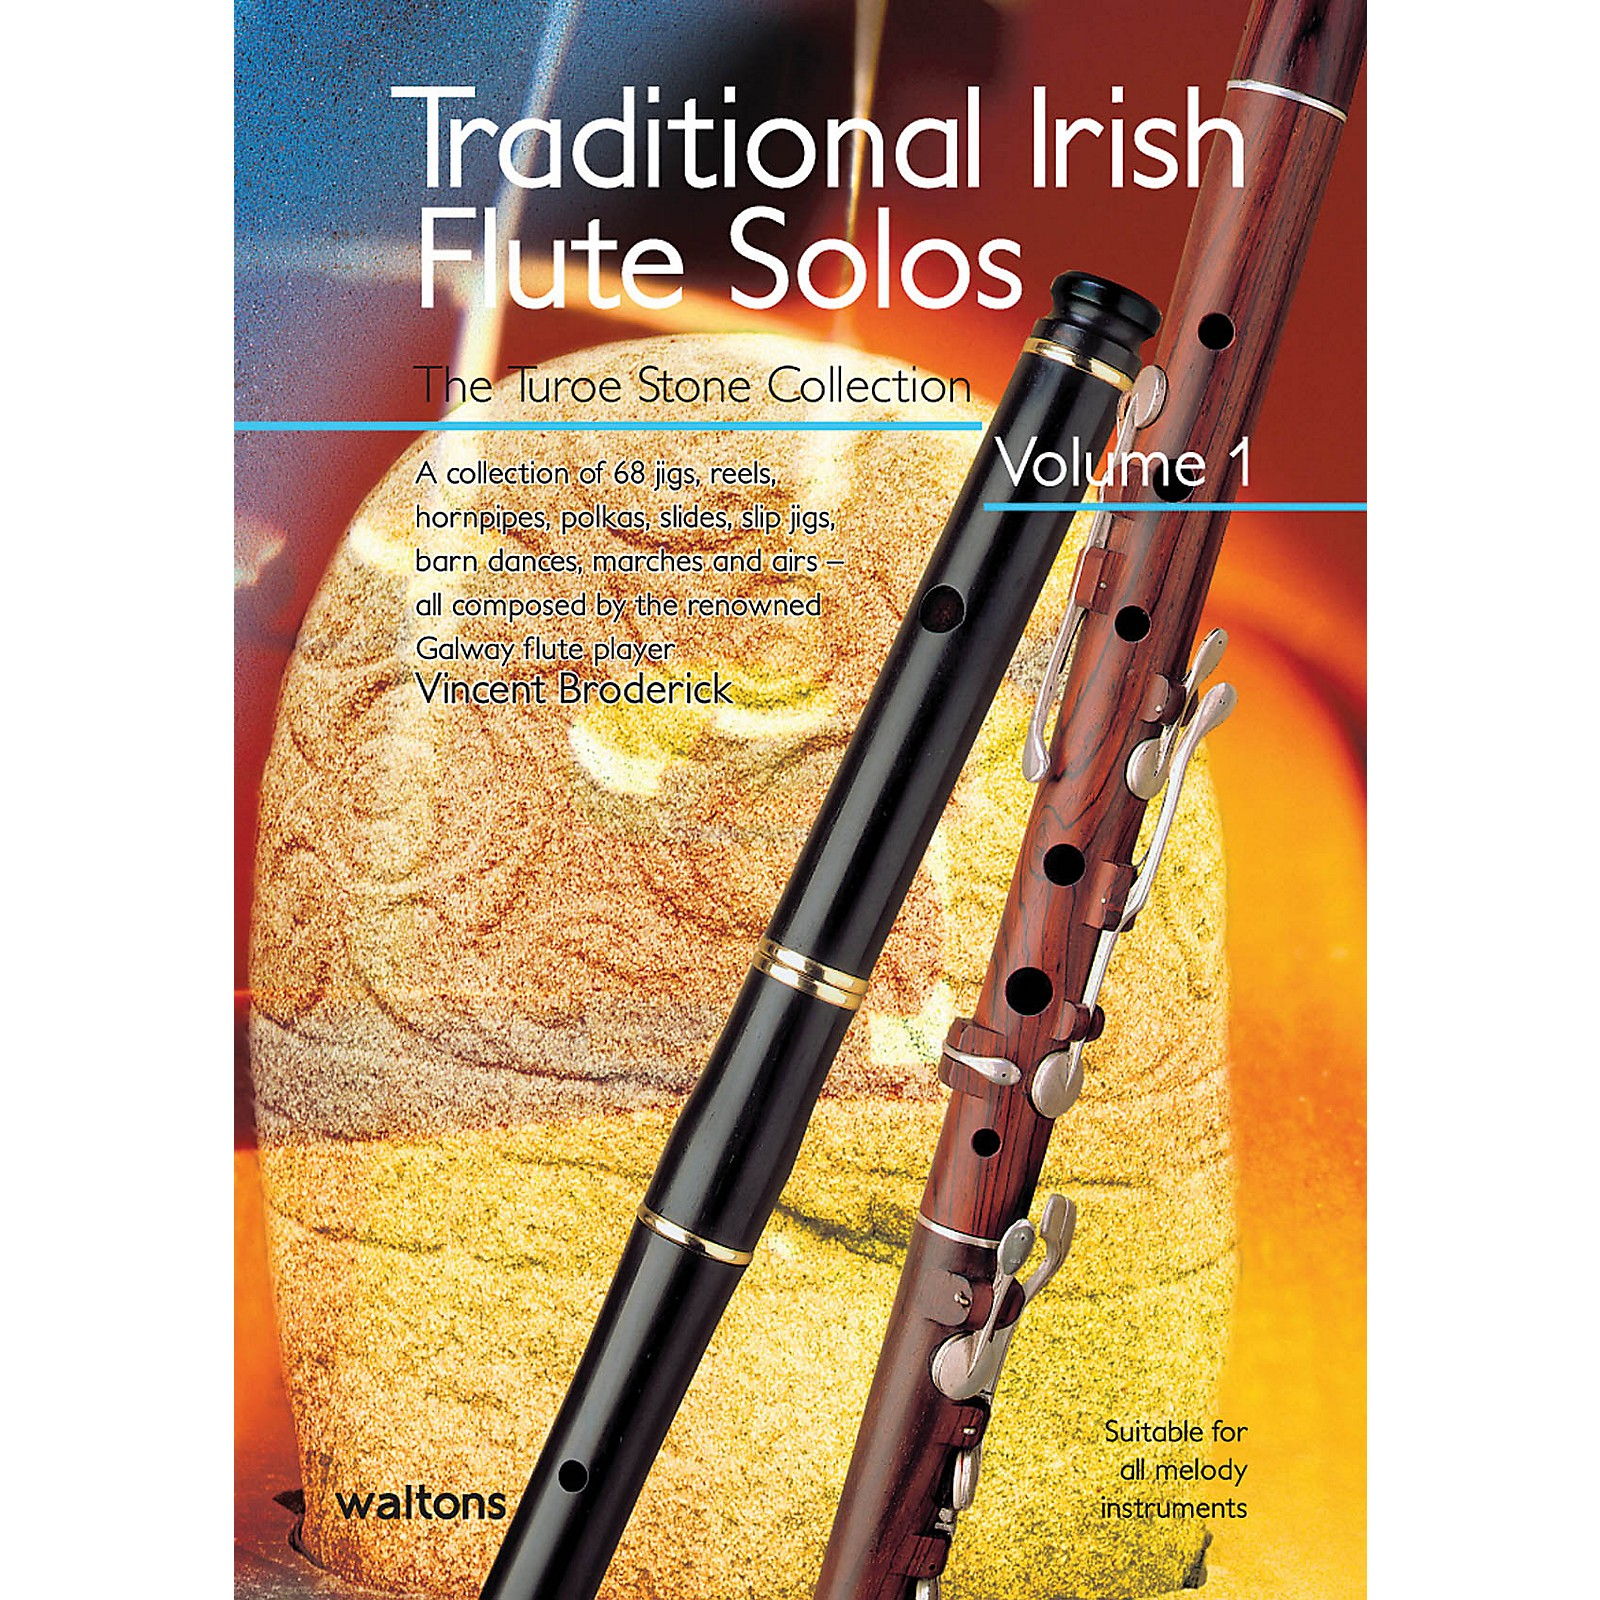 Waltons Traditional Irish Flute Solos - Volume 1 Waltons Irish Music Books Series Written by Vincent Broderick